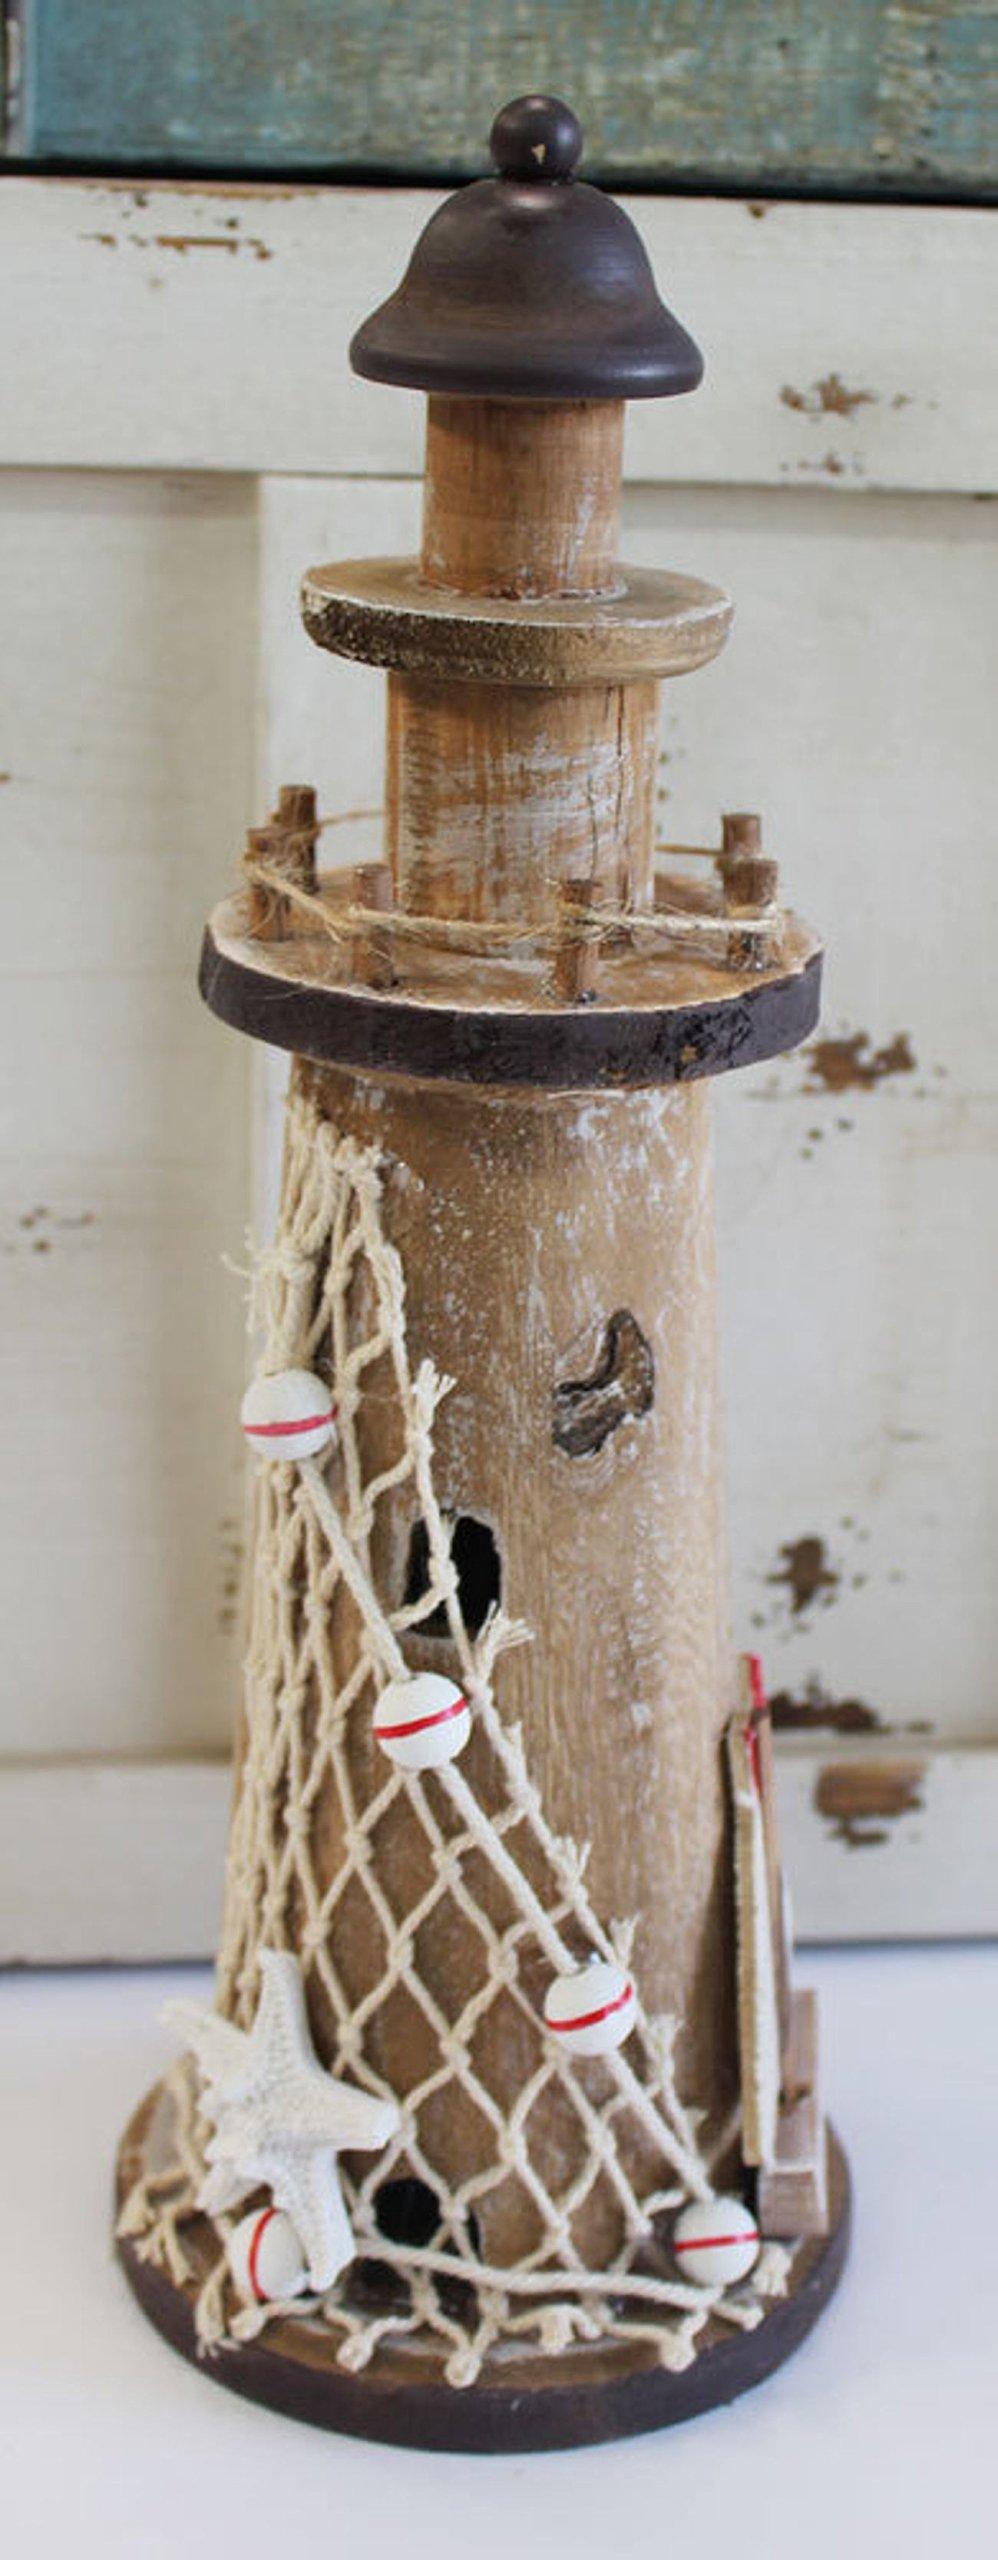 Nautical Wood Lighthouse with Sailboat